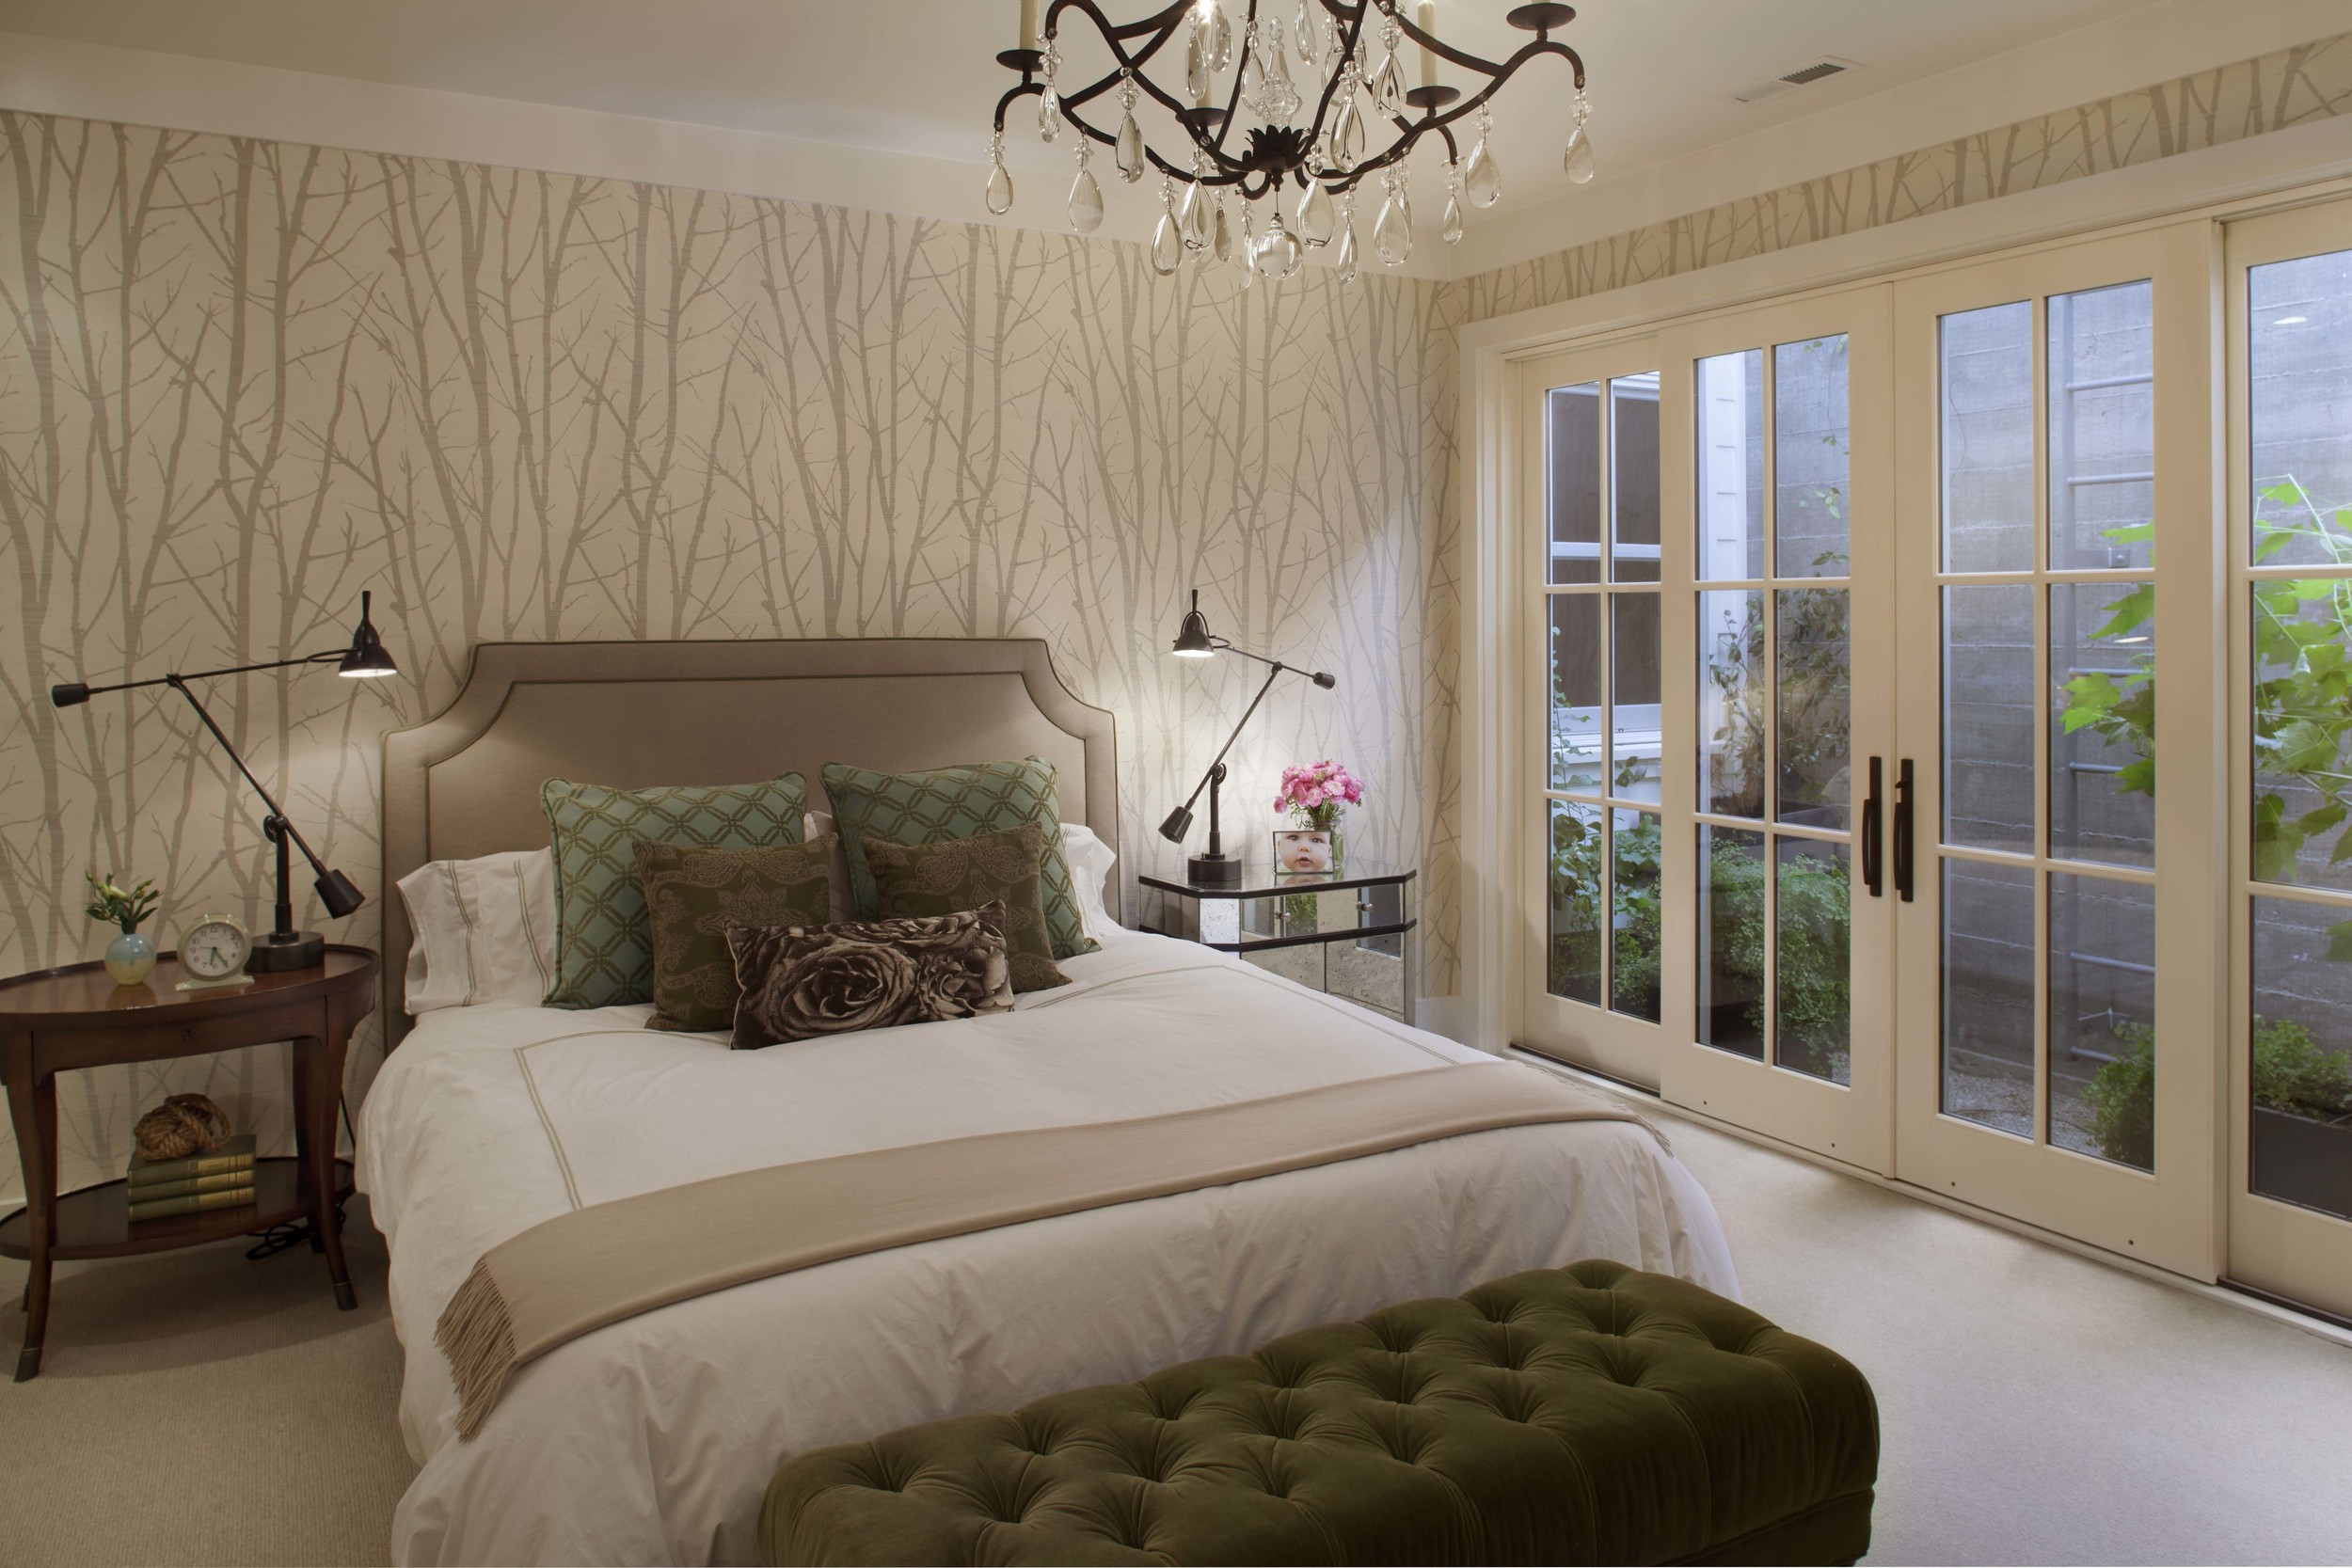 Modern Farmhouse: Guest bedroom